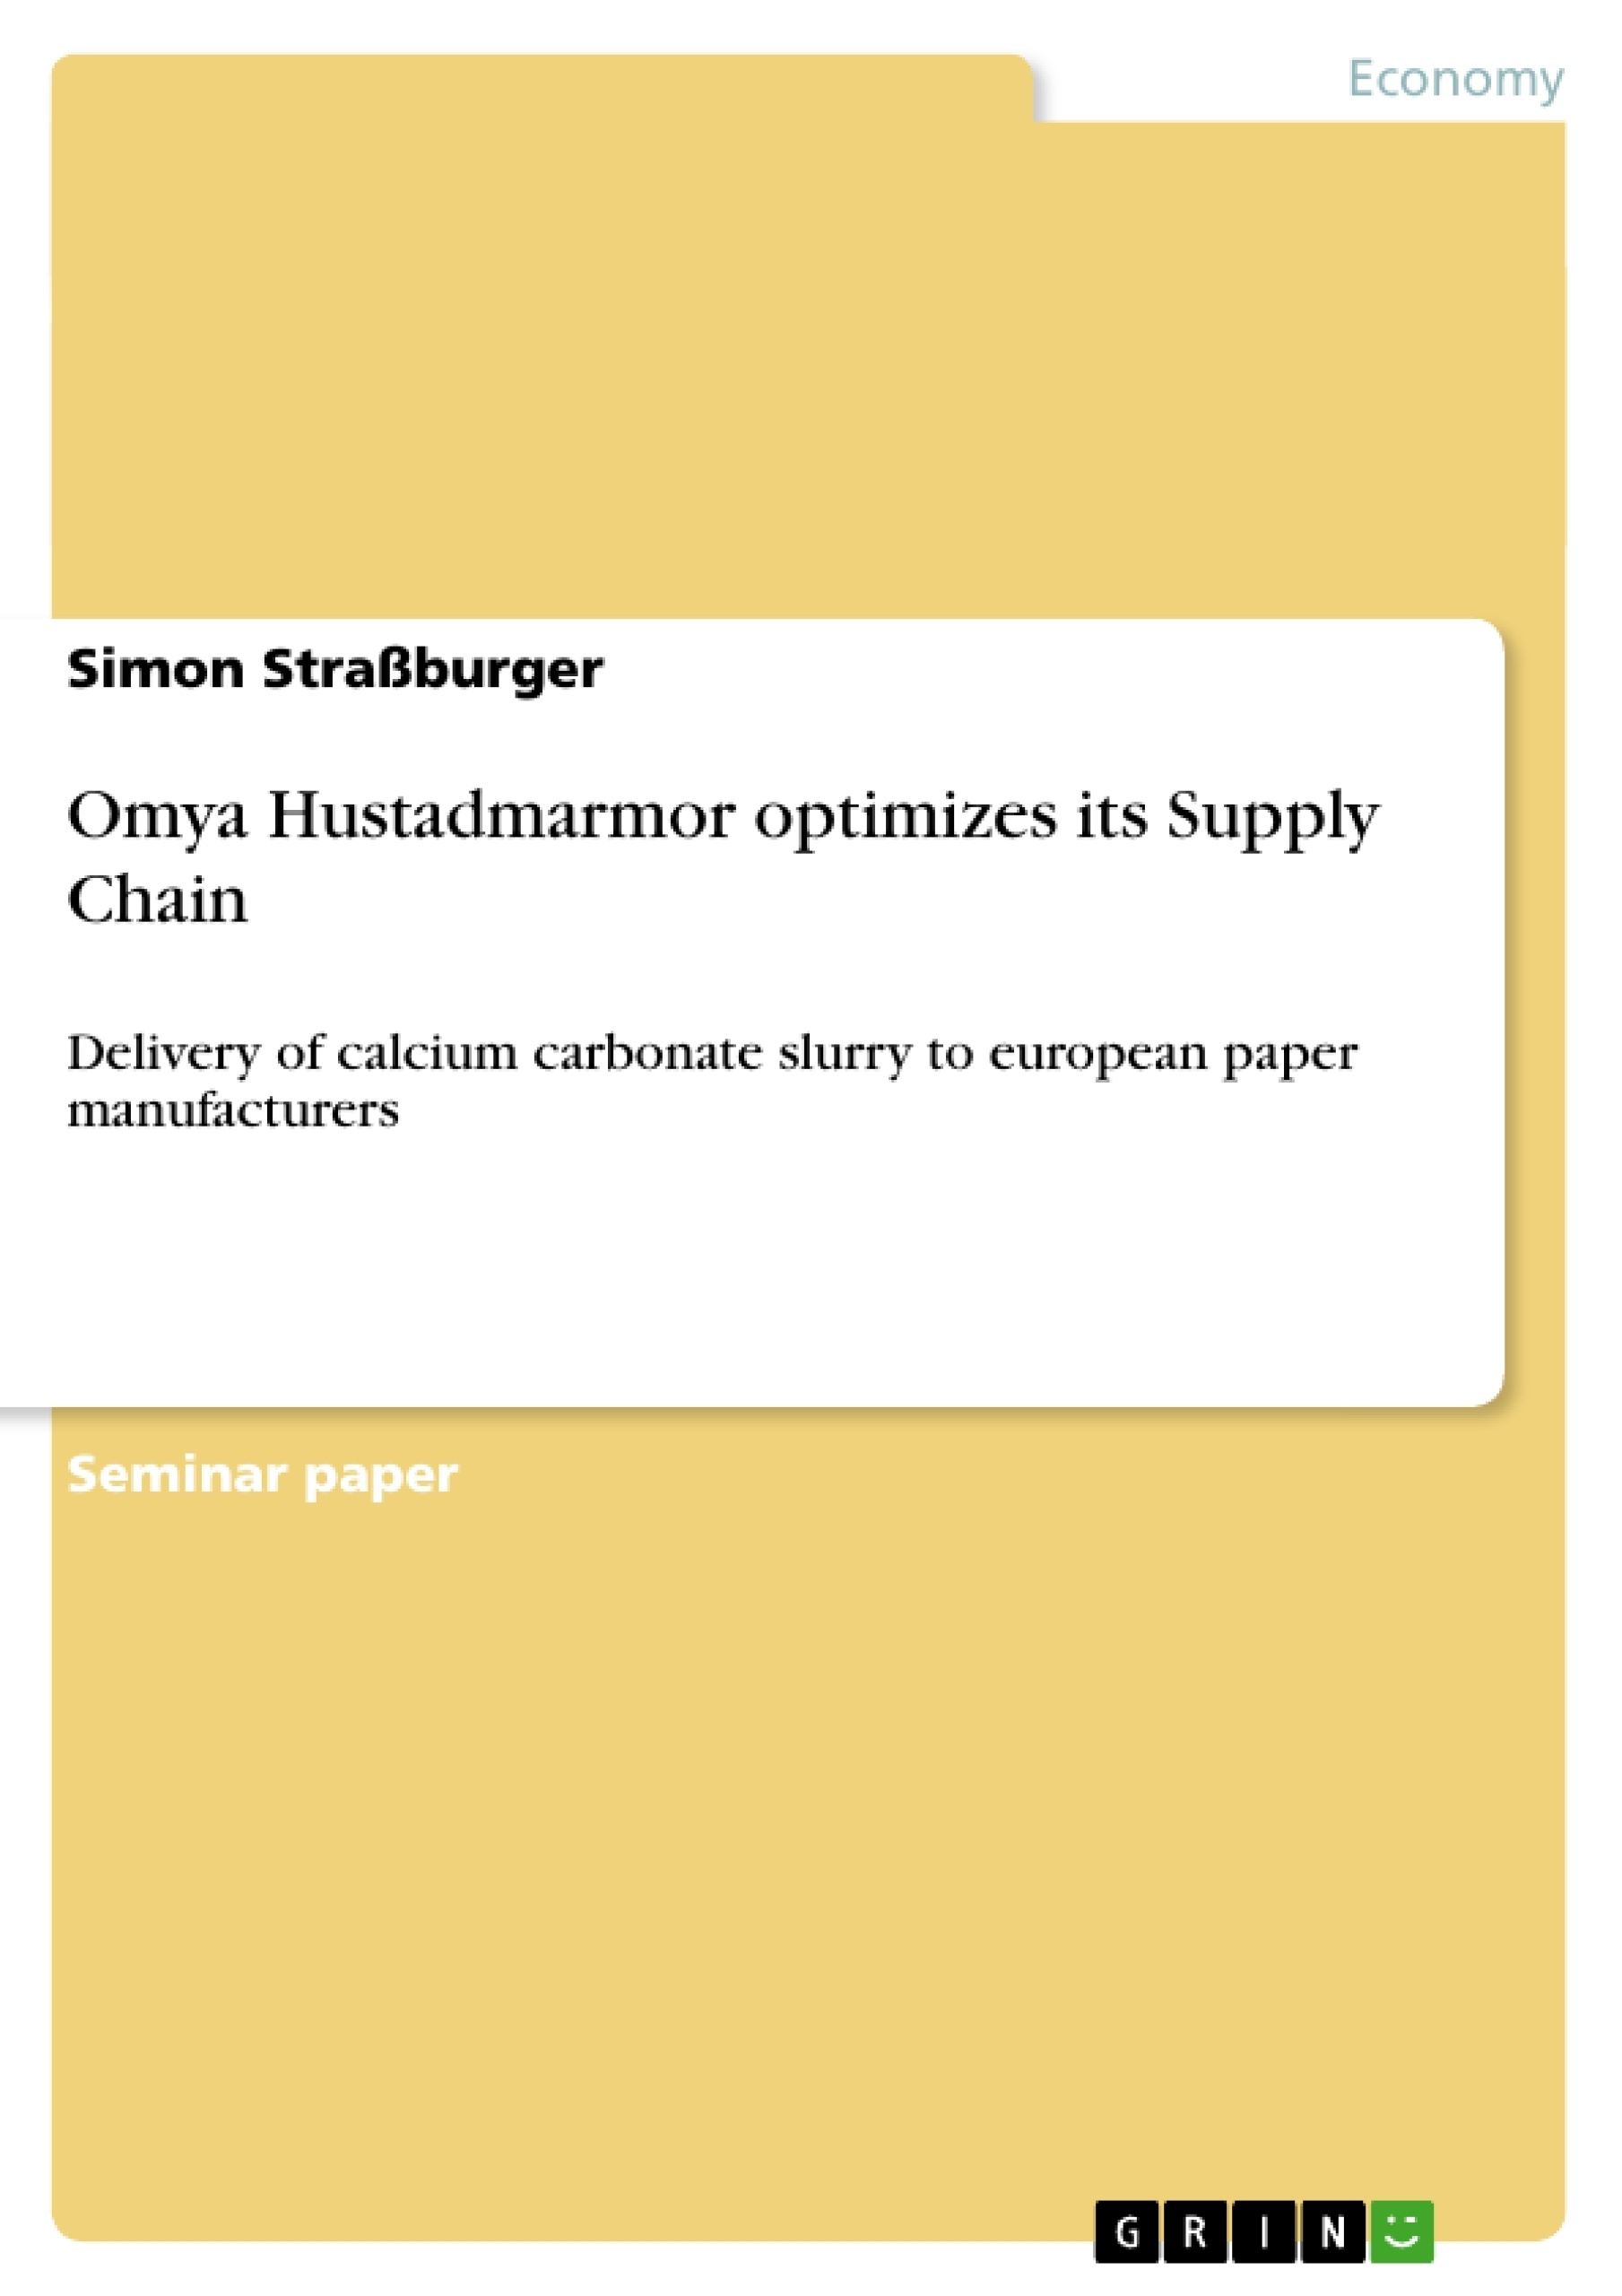 Title: Omya Hustadmarmor optimizes its Supply Chain